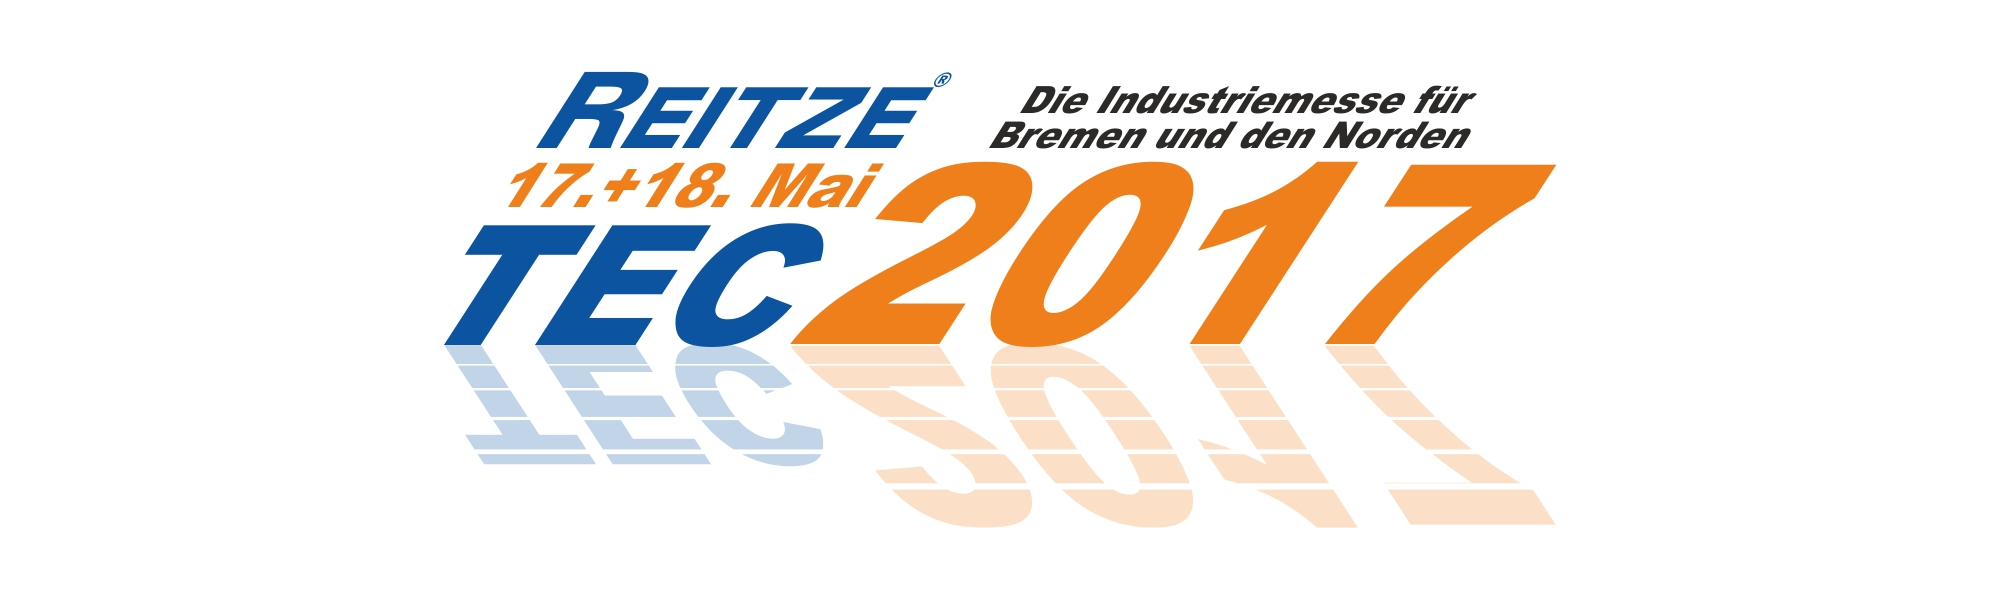 Banner - Logo2000x600